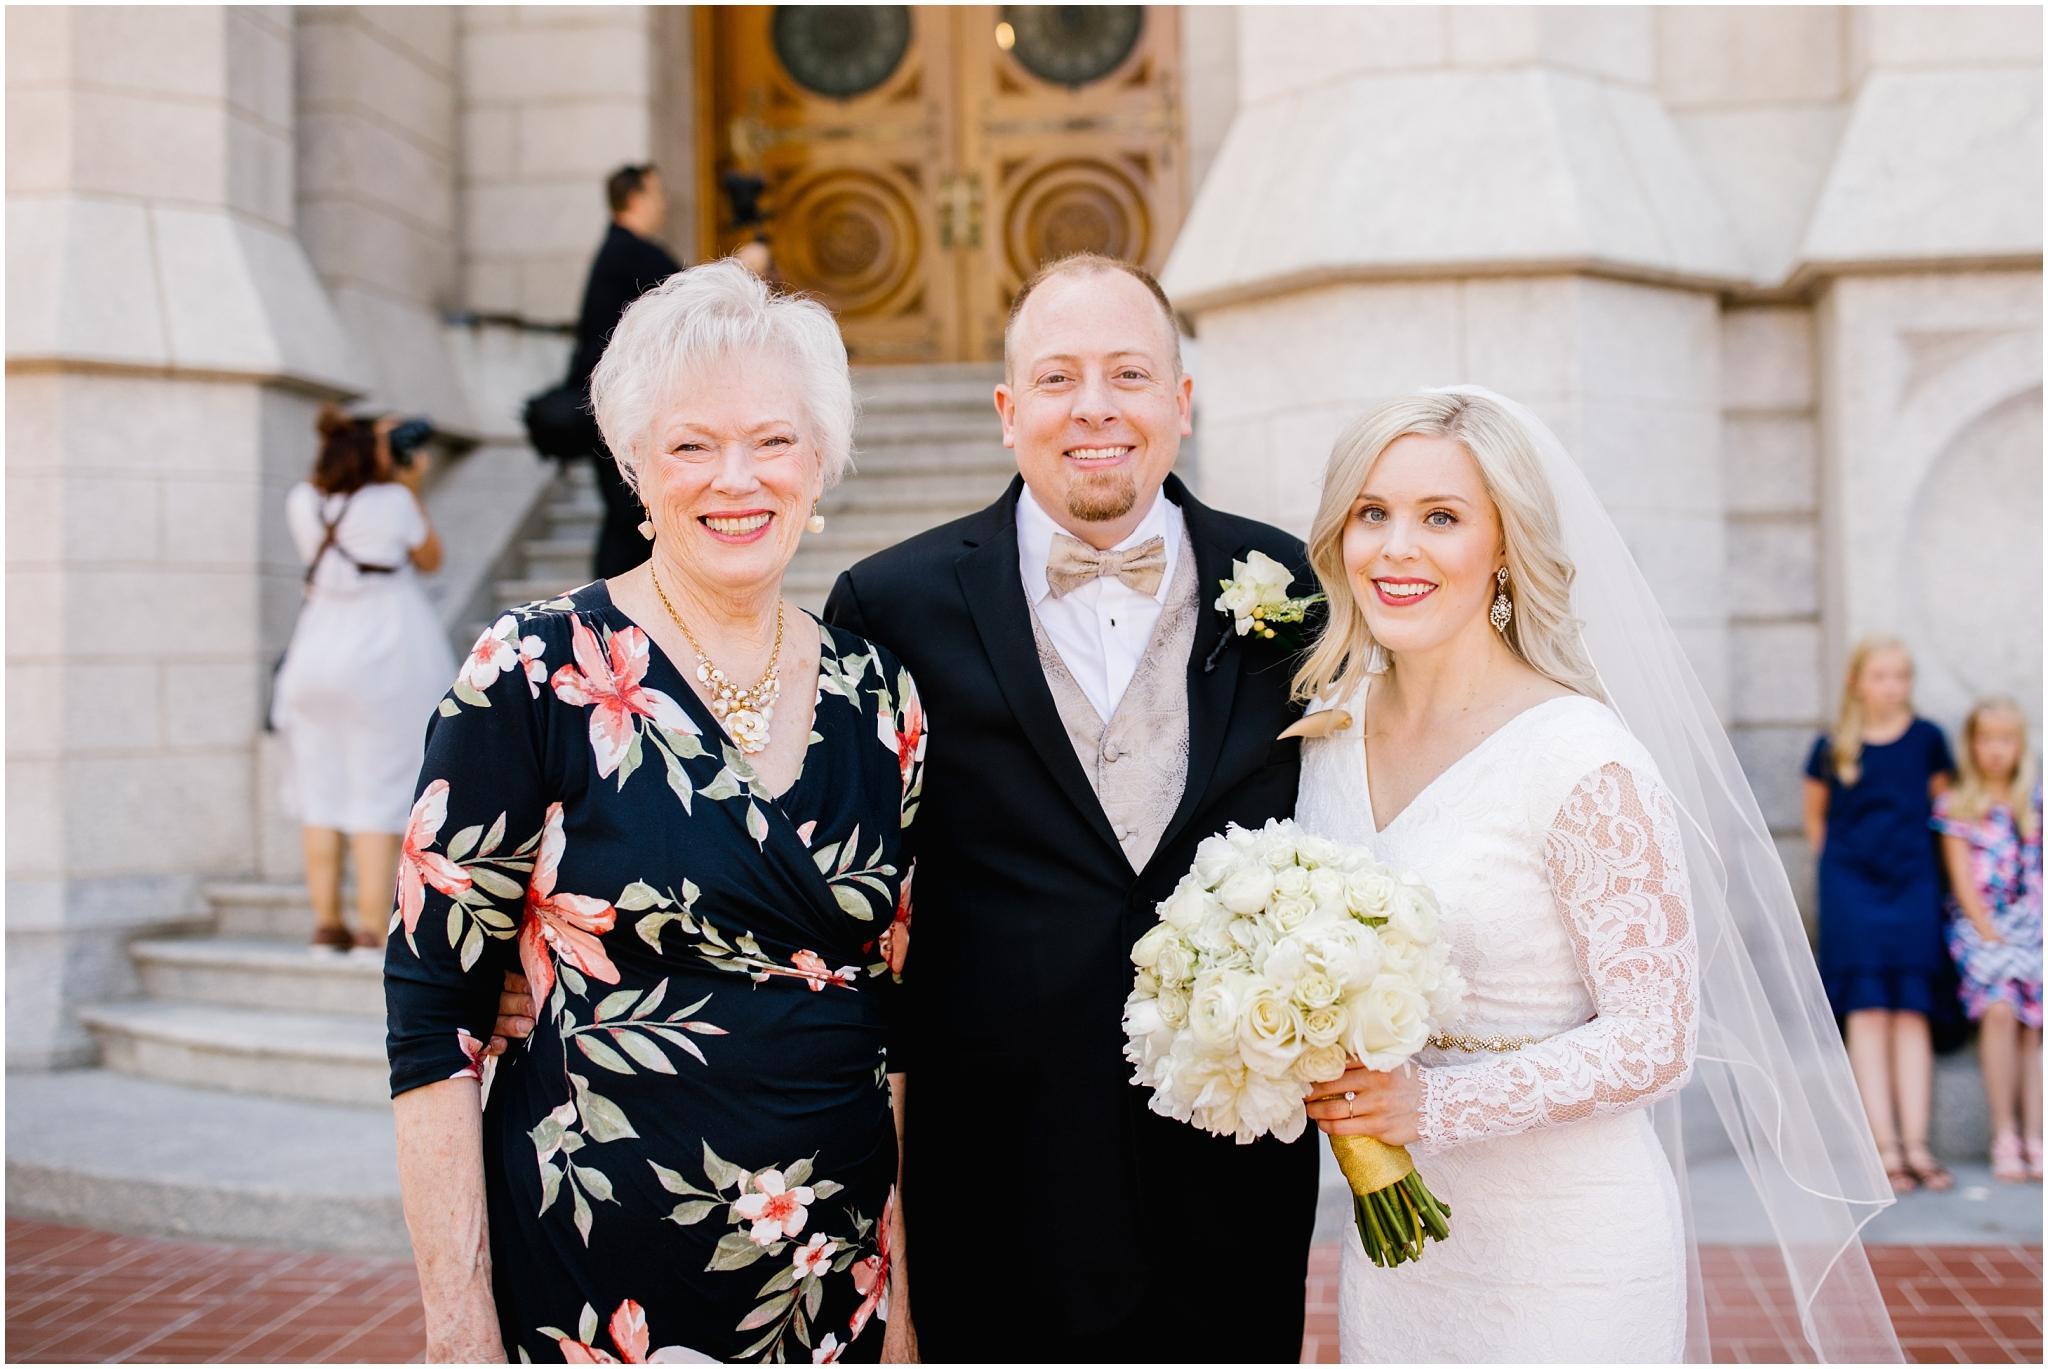 CherylandTyler-32_Lizzie-B-Imagery-Utah-Wedding-Photographer-Salt-Lake-City-Temple-Wells-Fargo-Building-Reception.jpg